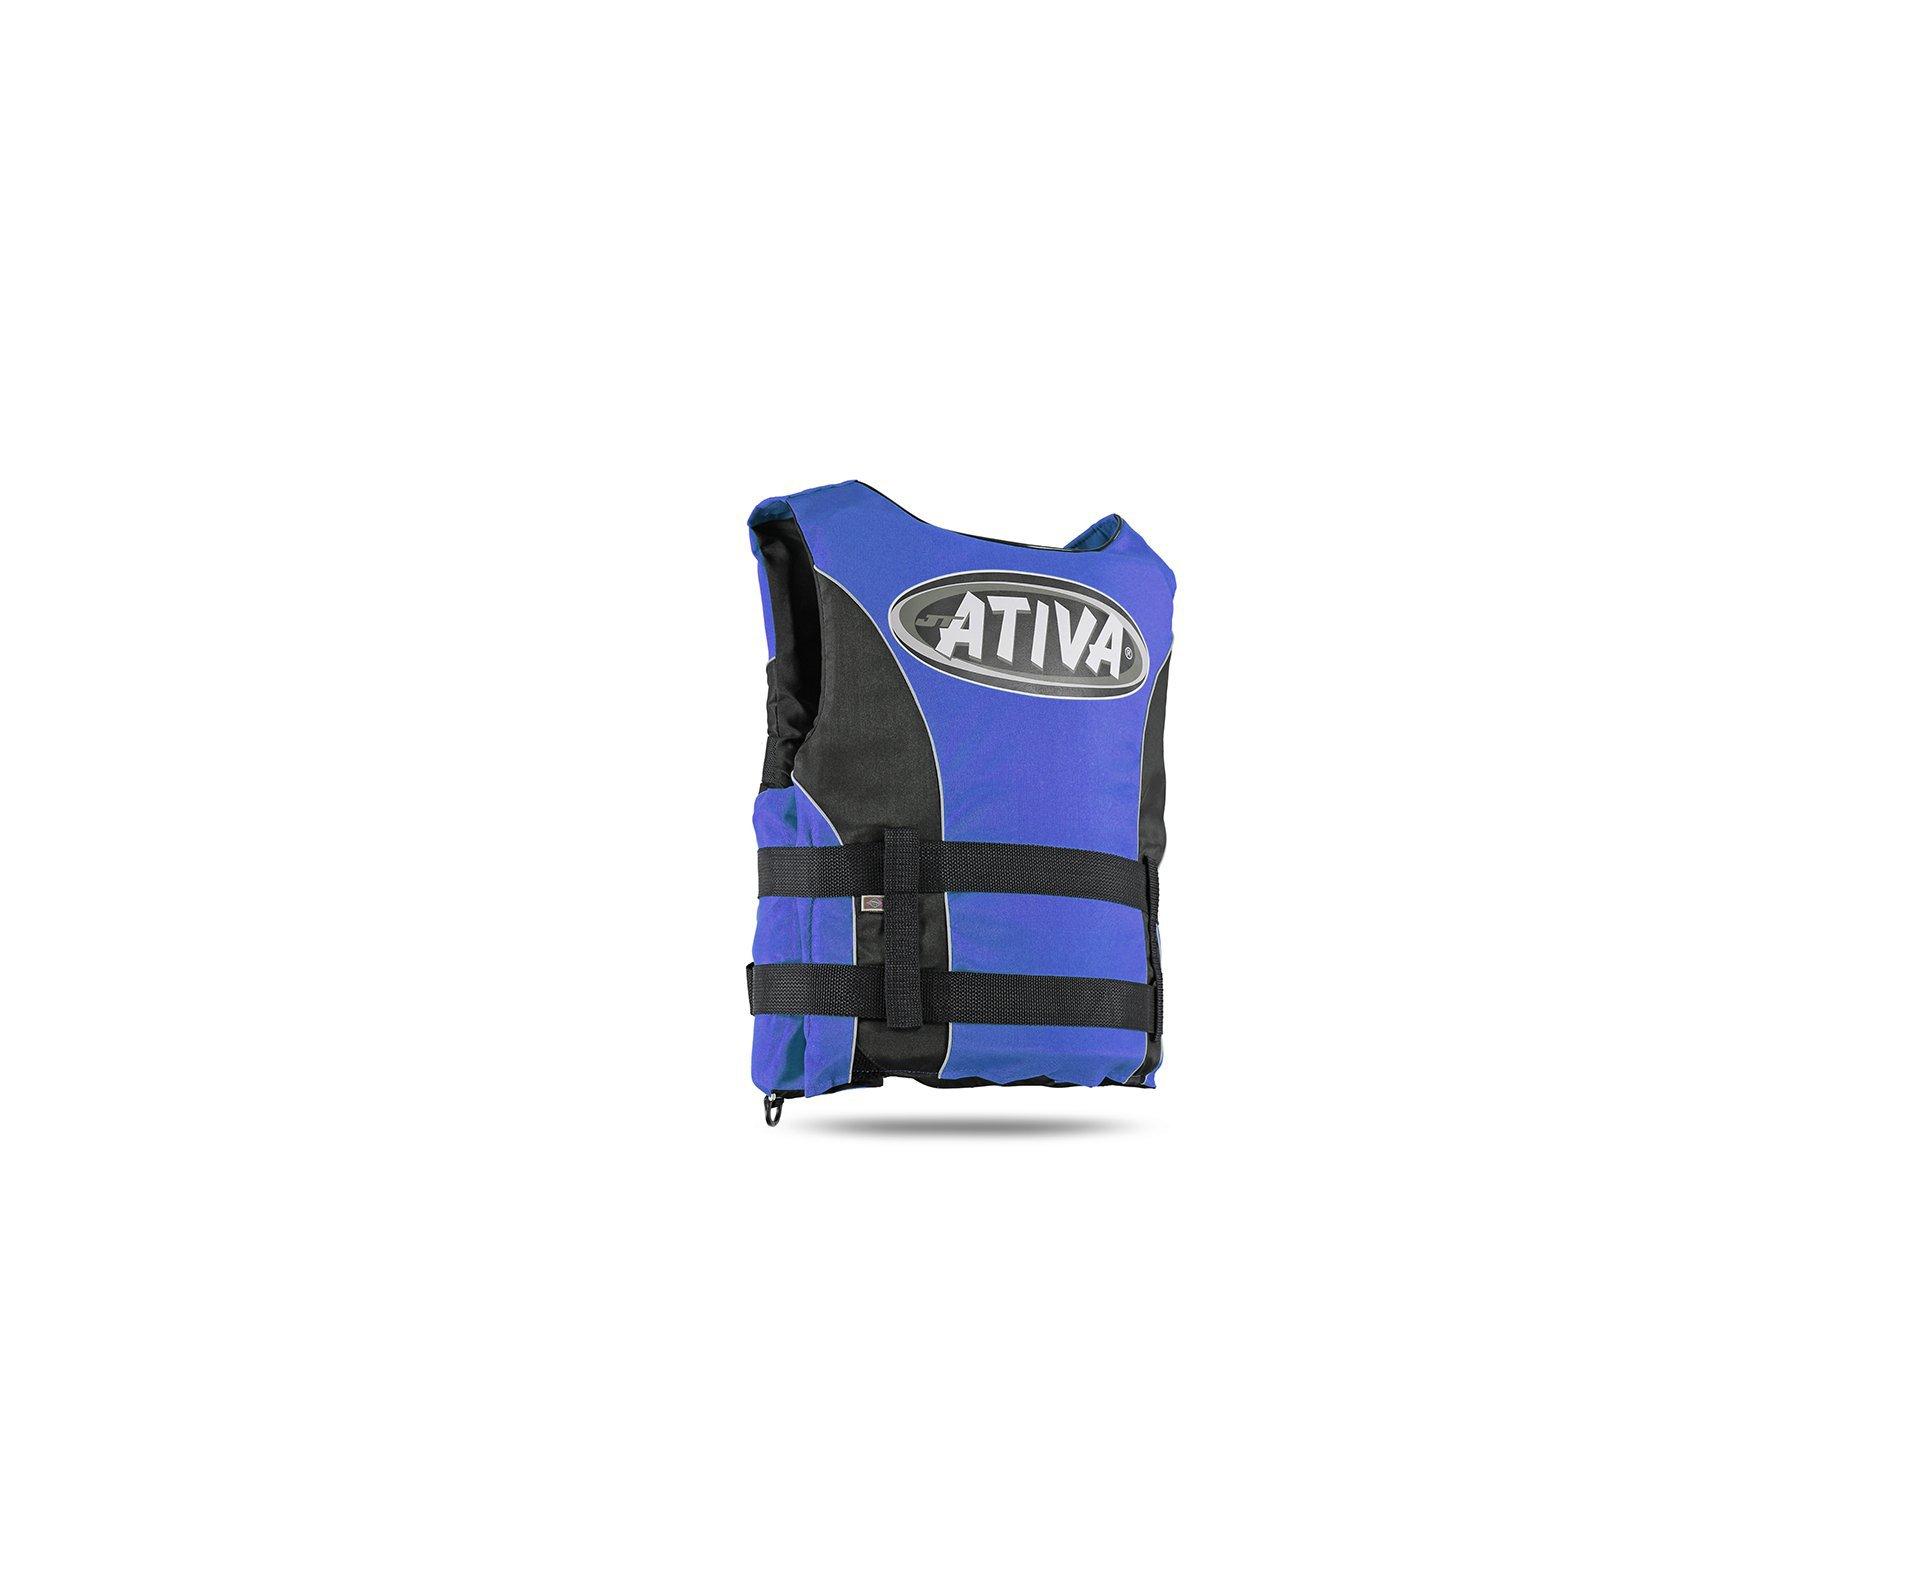 Colete Salva Vidas Nautico Ativa 55  Azul - Ativa - P